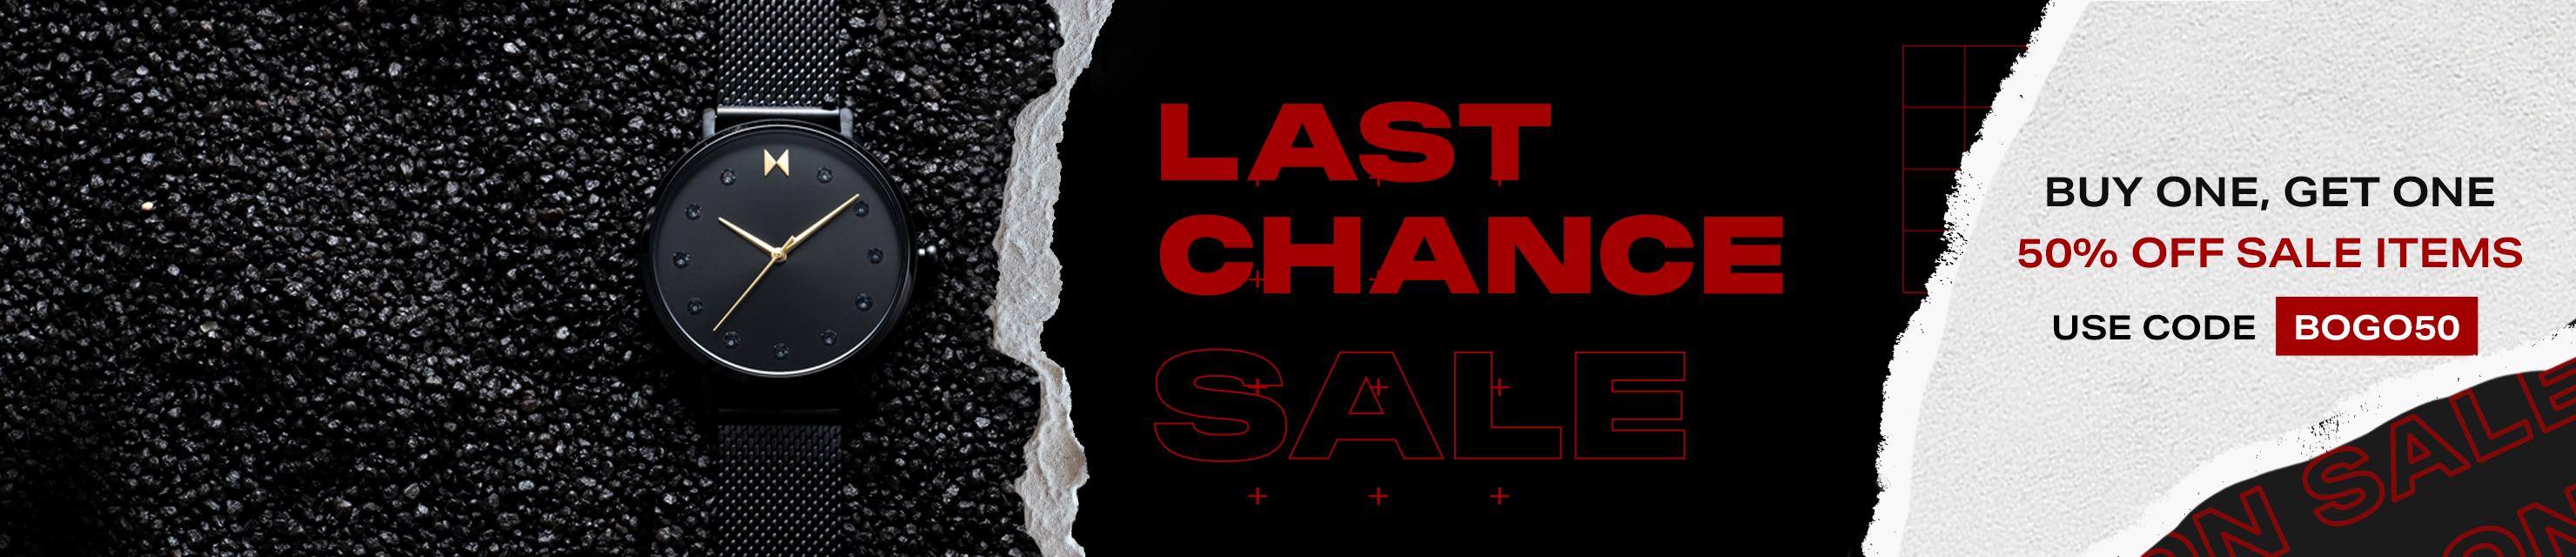 bogo sale all products mens black watch, womens black watch, black blue light glasses, black sunglasses, black mens bracelet on red background